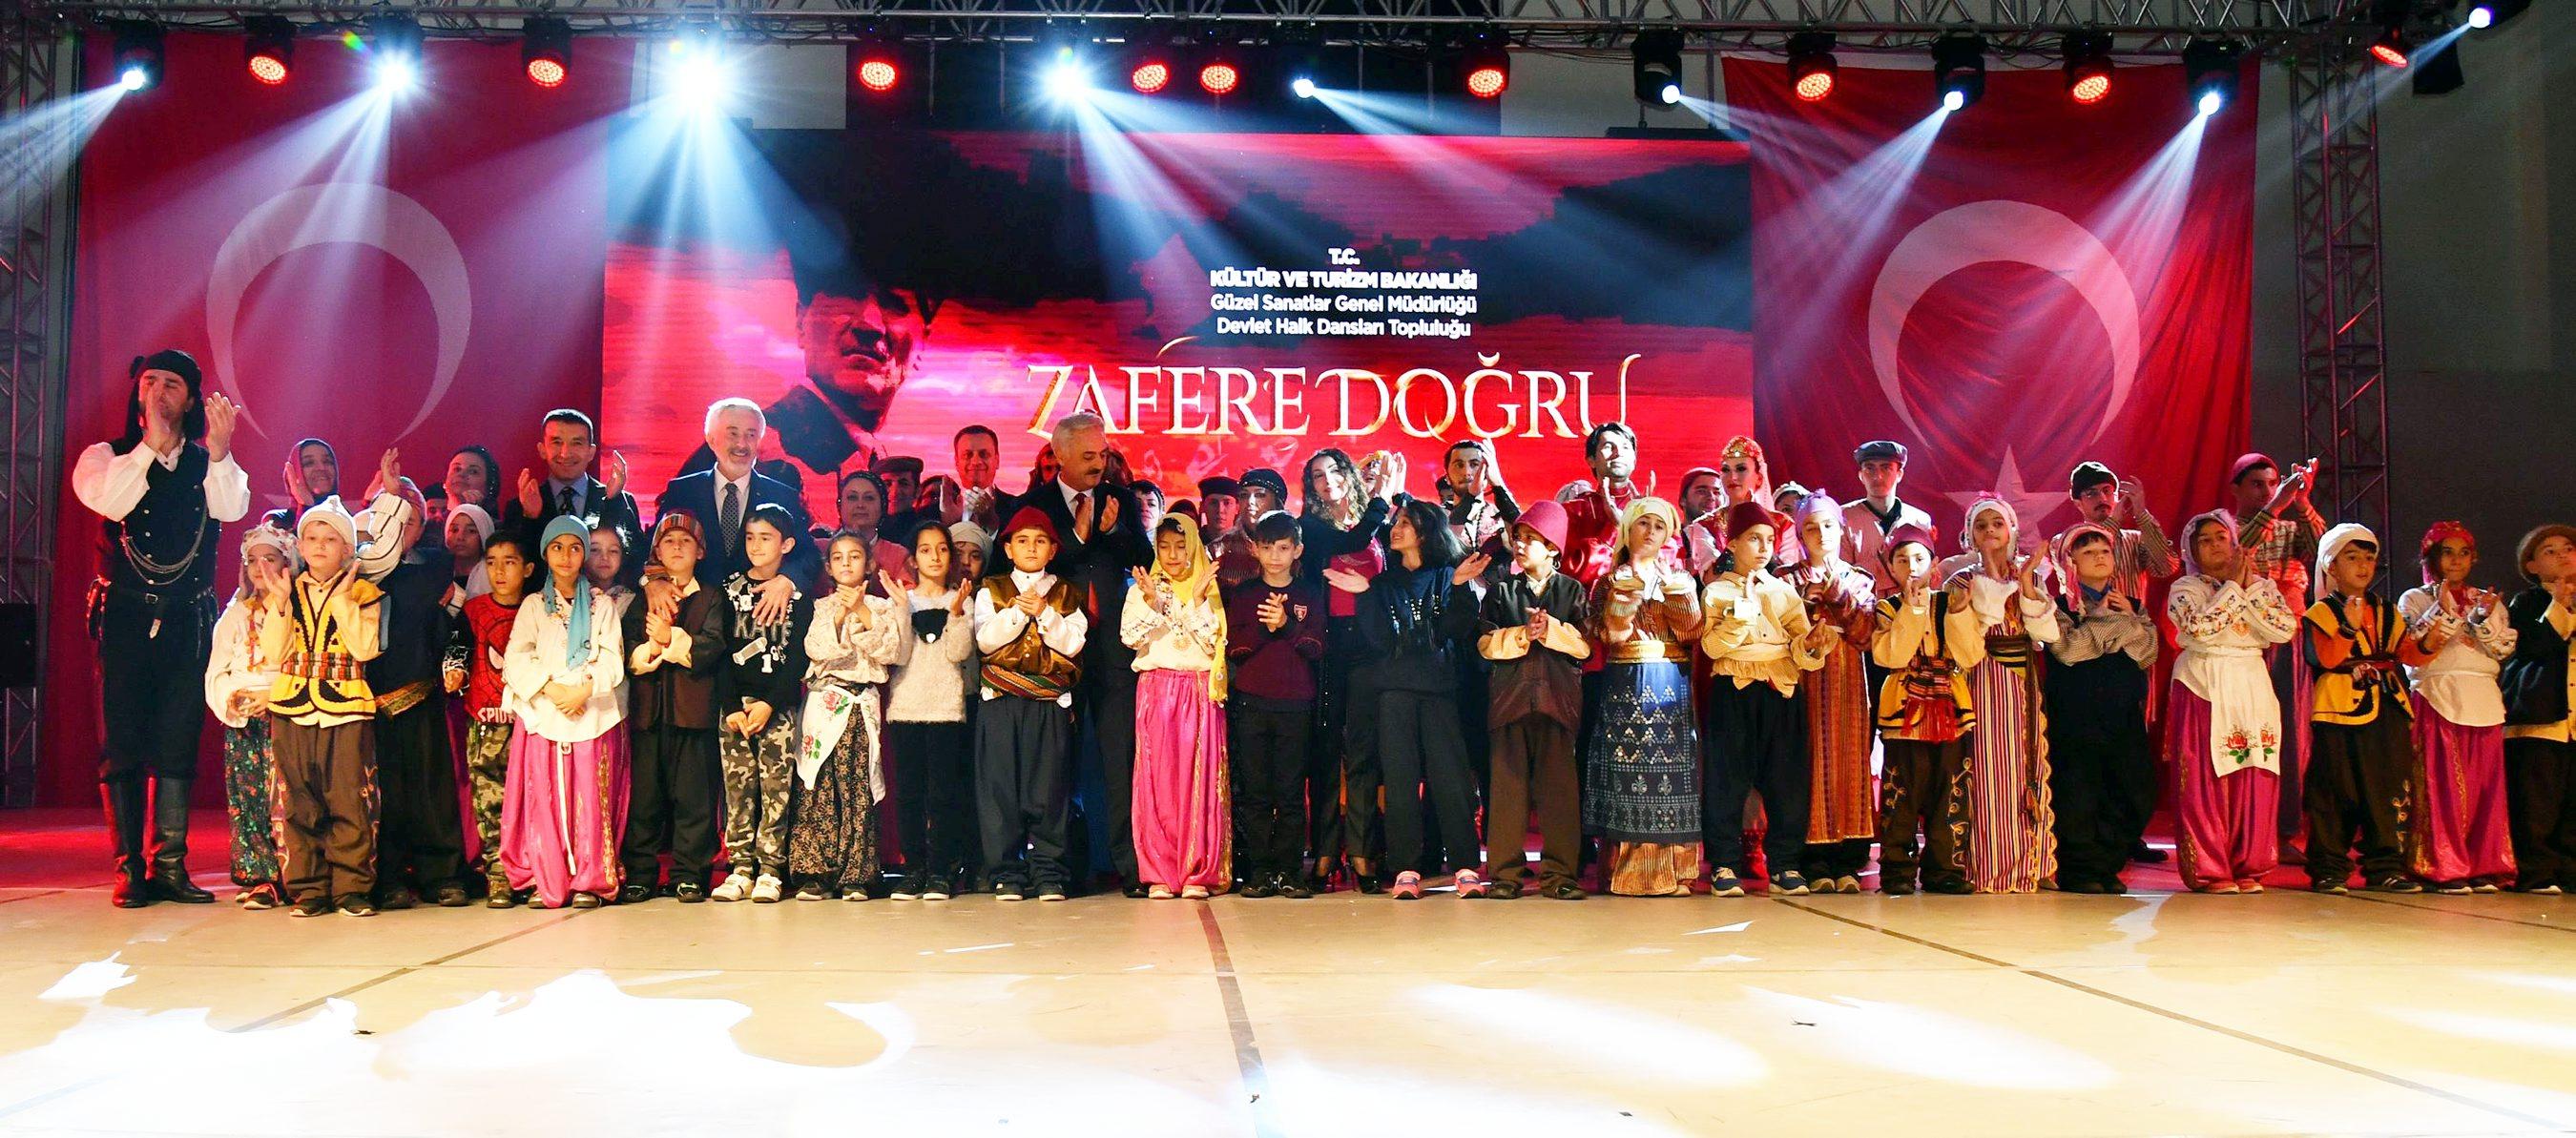 02-11-2019-zafere-dogru-temsil-gosteri-3